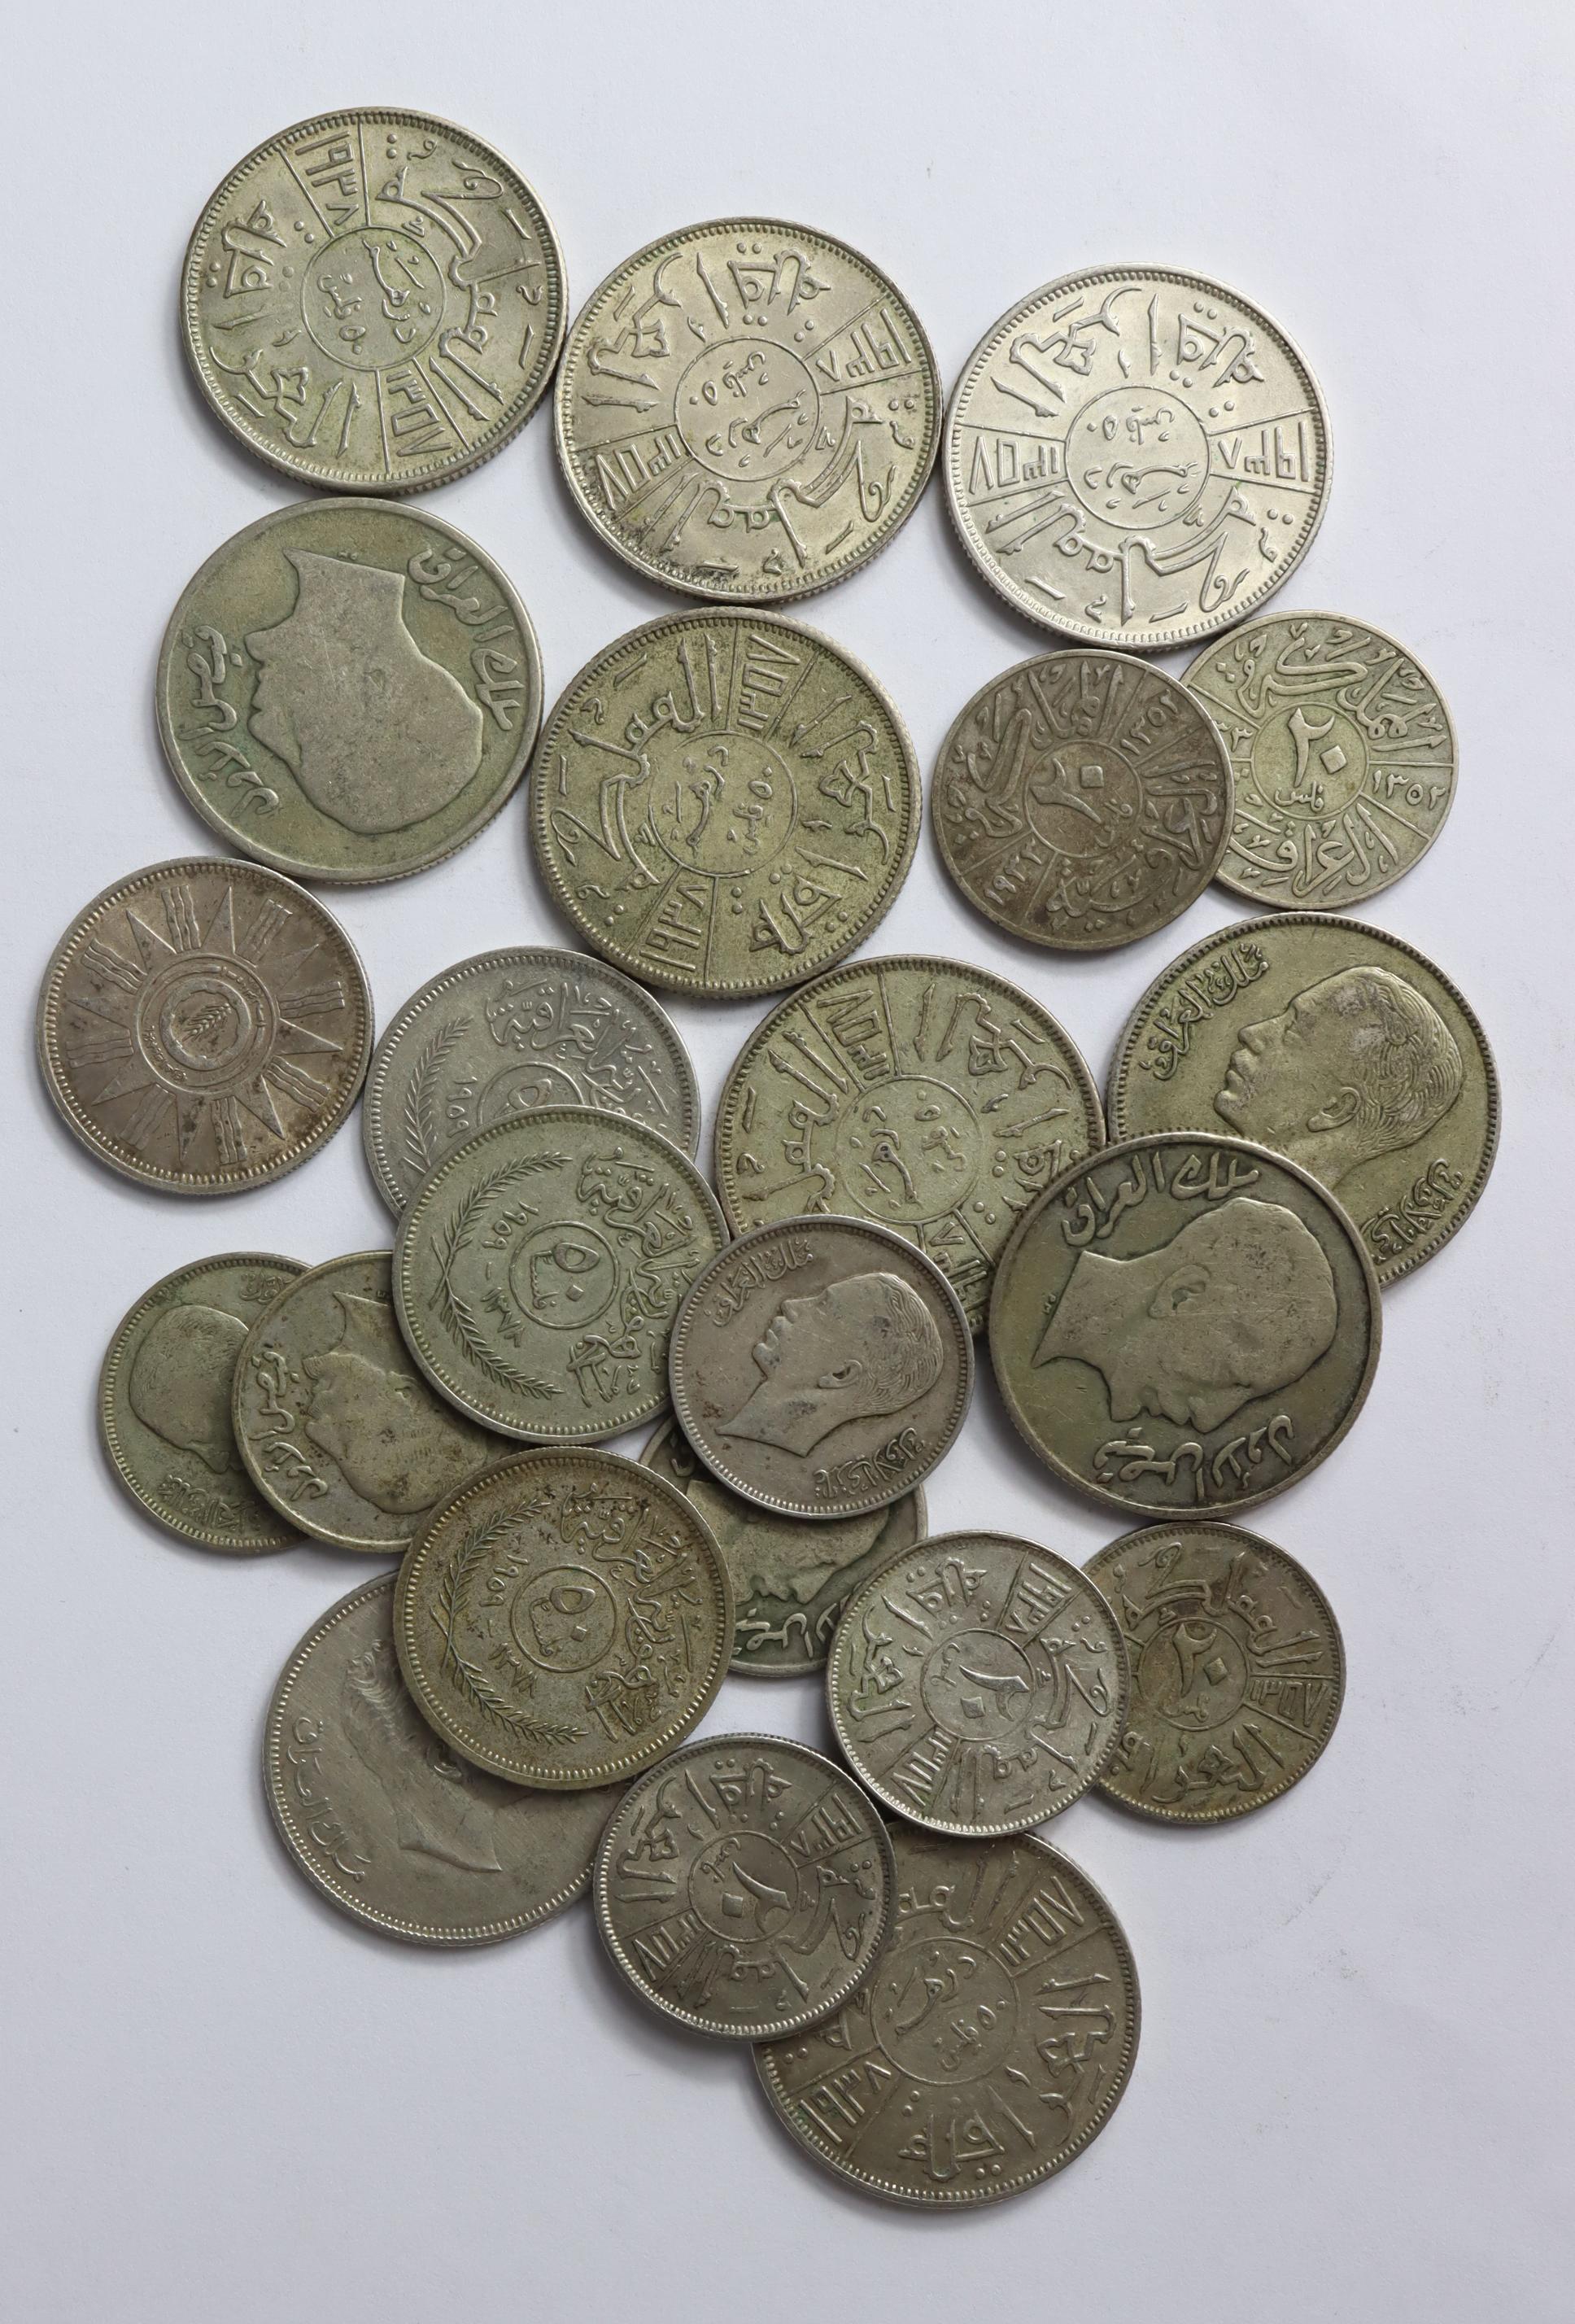 Iraq silver coins (23) 20thC, mixed grade.